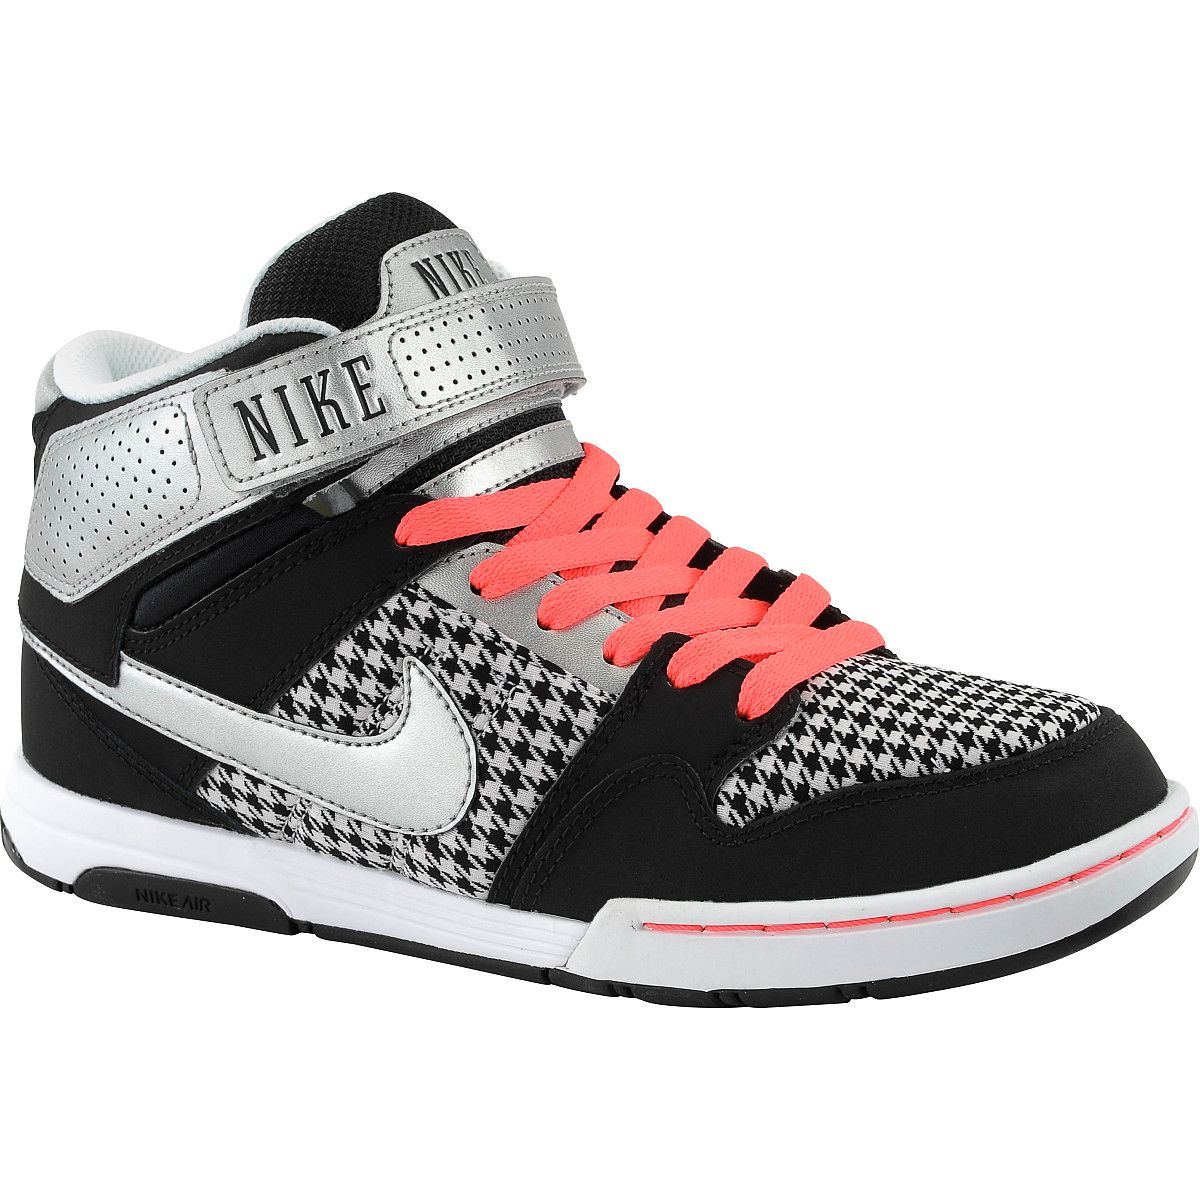 NIKE Women's Air Mogan 2 Mid Skate Shoes